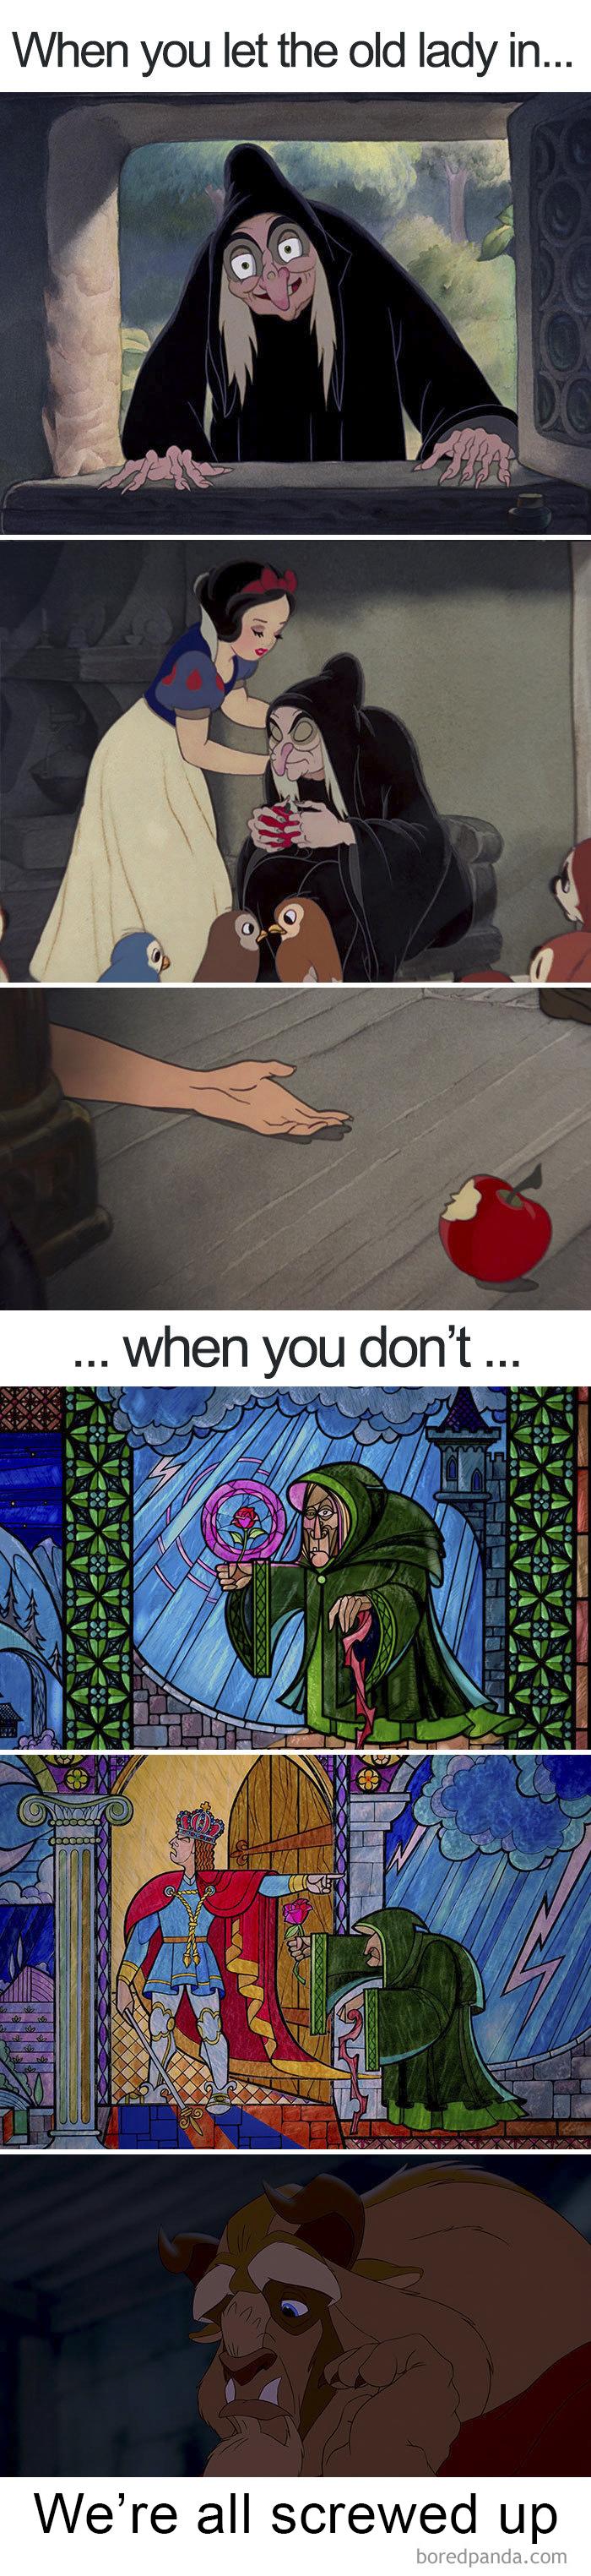 funny-disney-memes-5-5ab9029be4dab__700-5abdf78cd2269__700 20+ Of The Funniest Disney Jokes Ever Design Random